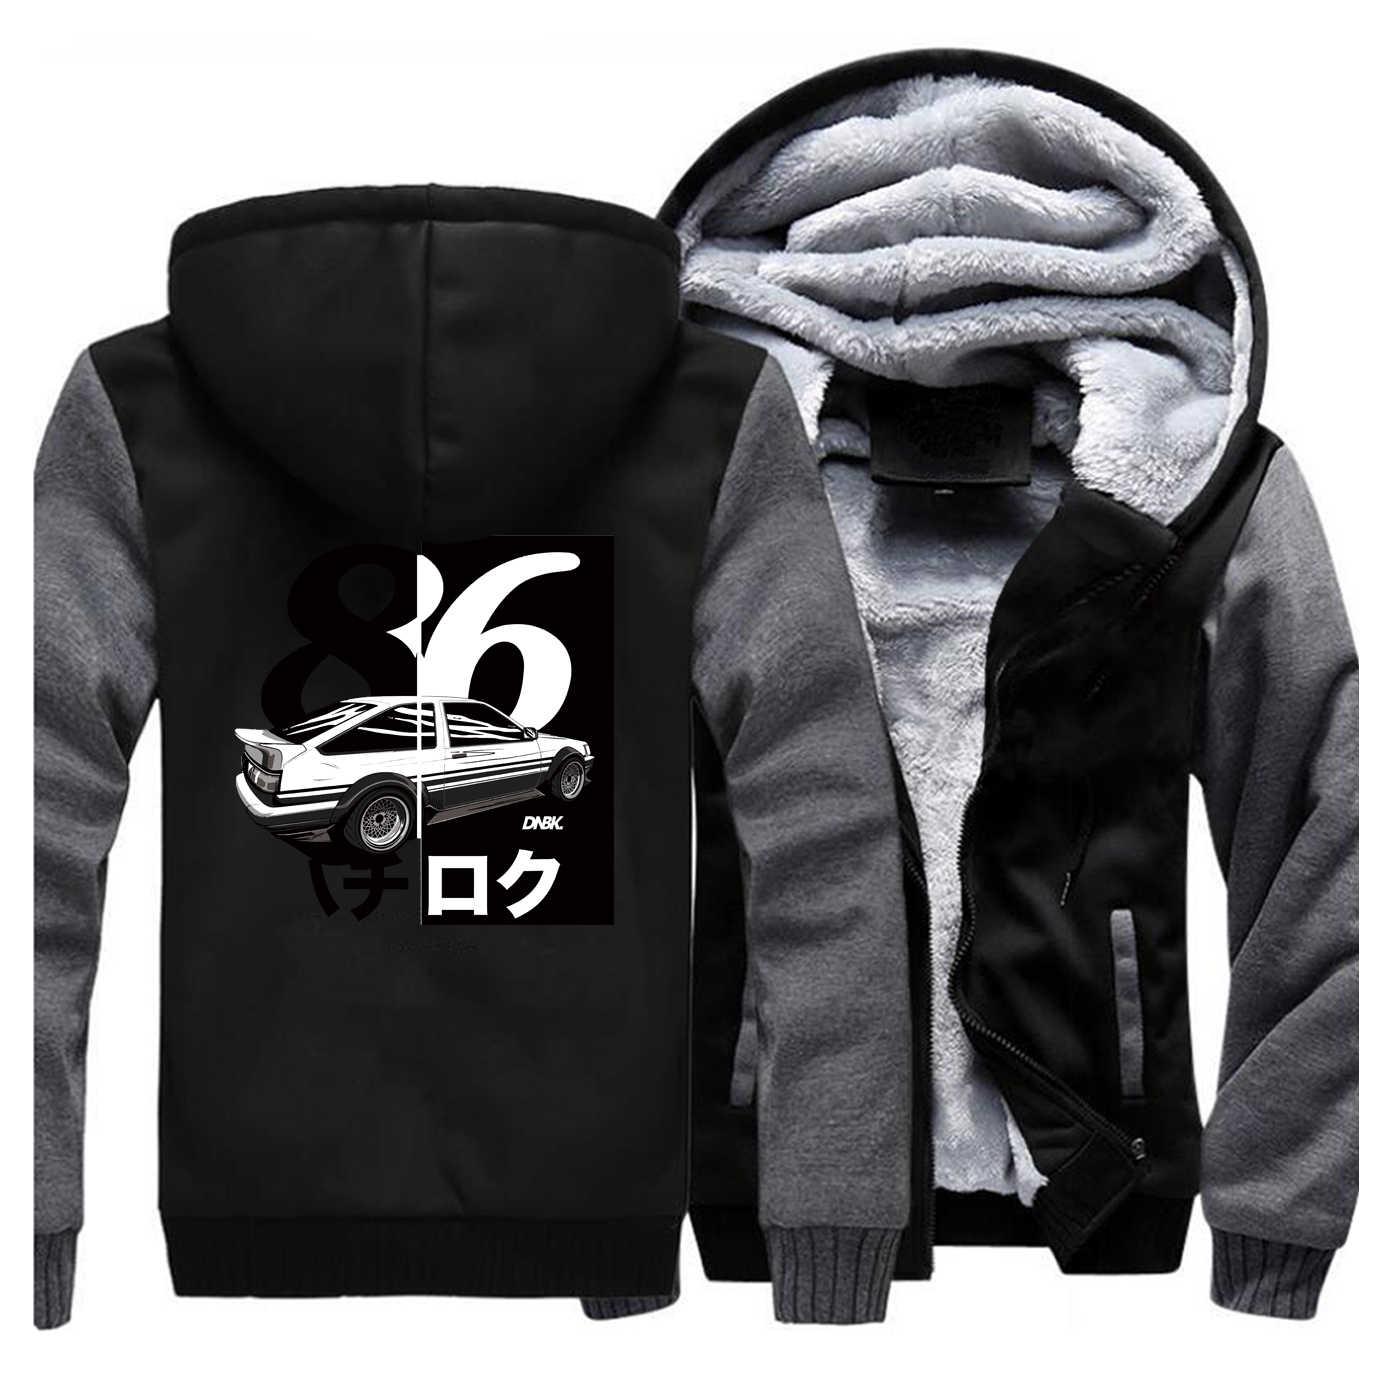 Initial D Winter Männer Fleece Dicke Warme Jacke Herren Mäntel Und Jacken Harajuku Hoodies Sweatshirt Verdicken Sweatshirts Sportswear